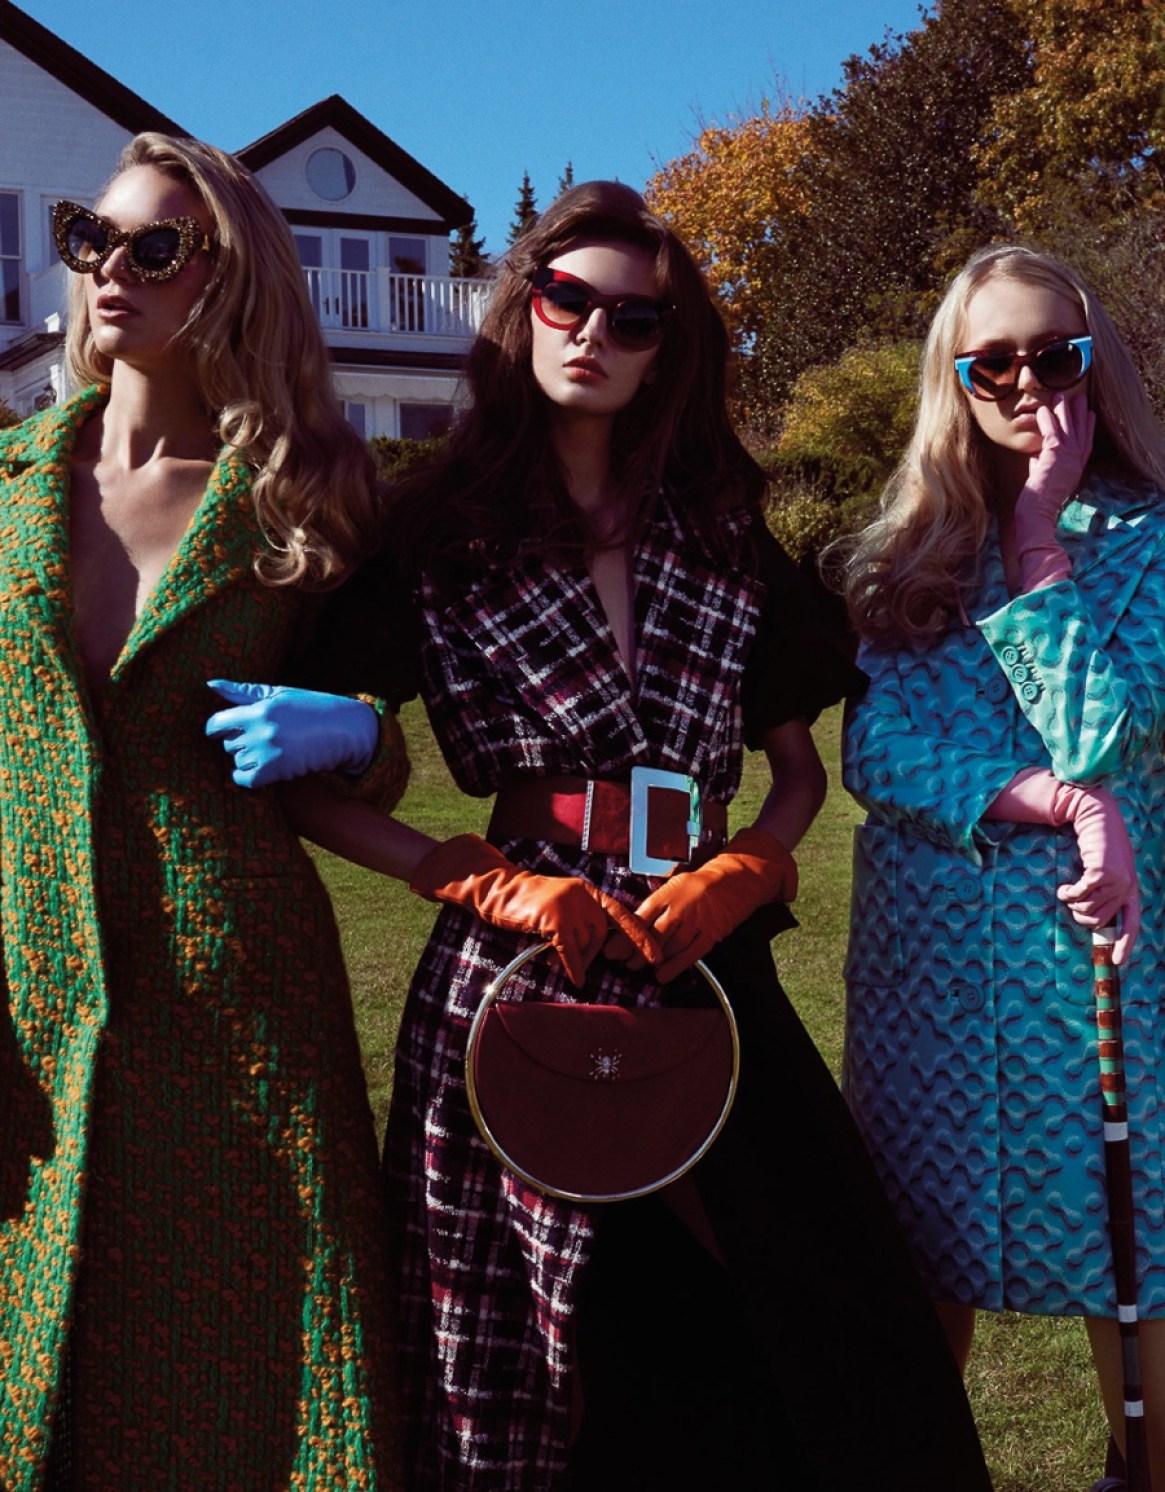 jamie-nelson-editorial-photography_best-vogue-editorials-2016_Yulia-Erkamova-editorials_Yulia-Erkamova-personal-style_Katie-Moore-editorials_Katie-Moore-personal-fashion-style_Ezter-Boldov-editorials_Ezter-Boldov-fashion-style_Nika-Lauratis-editorials_Nika-Lauratis-personal-fashion-style_Lisa-Jarvis-stylist_best-british-fashion-blogs-2016